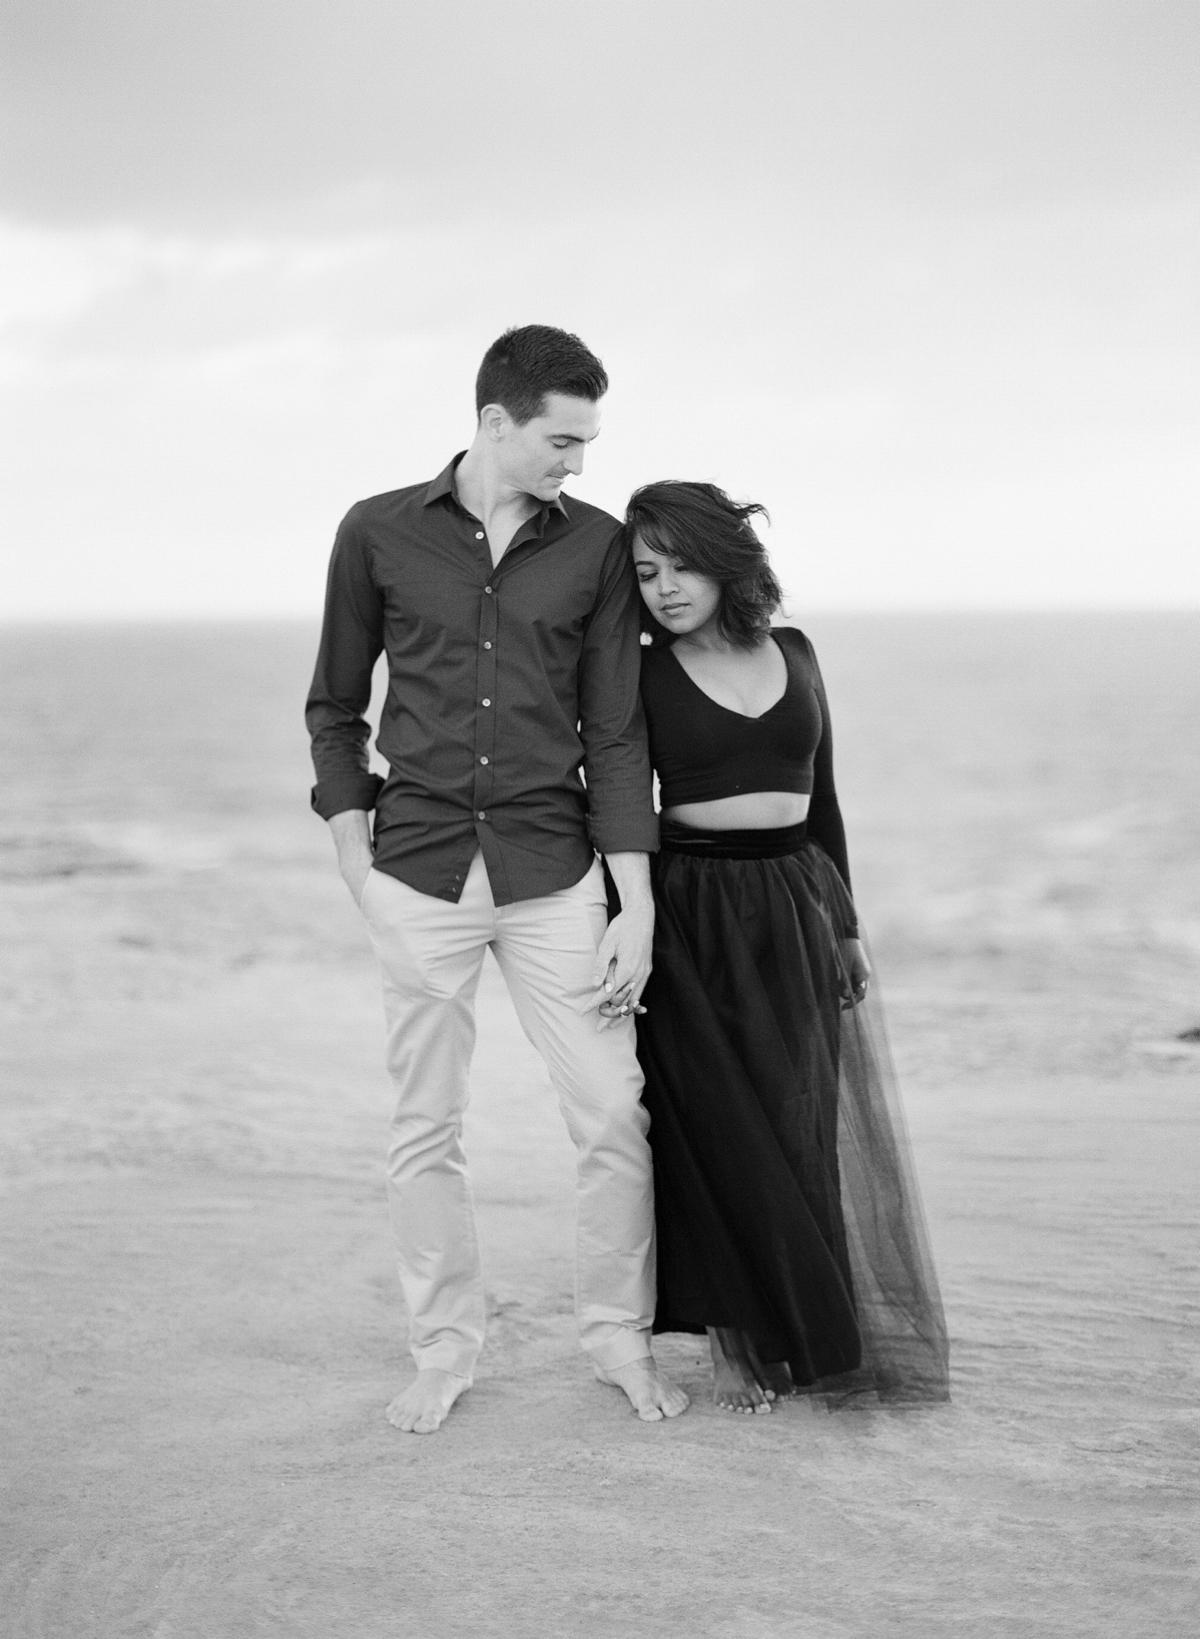 Coastal Sydney couples session by Mr Edwards Photography_0737_1166.jpg